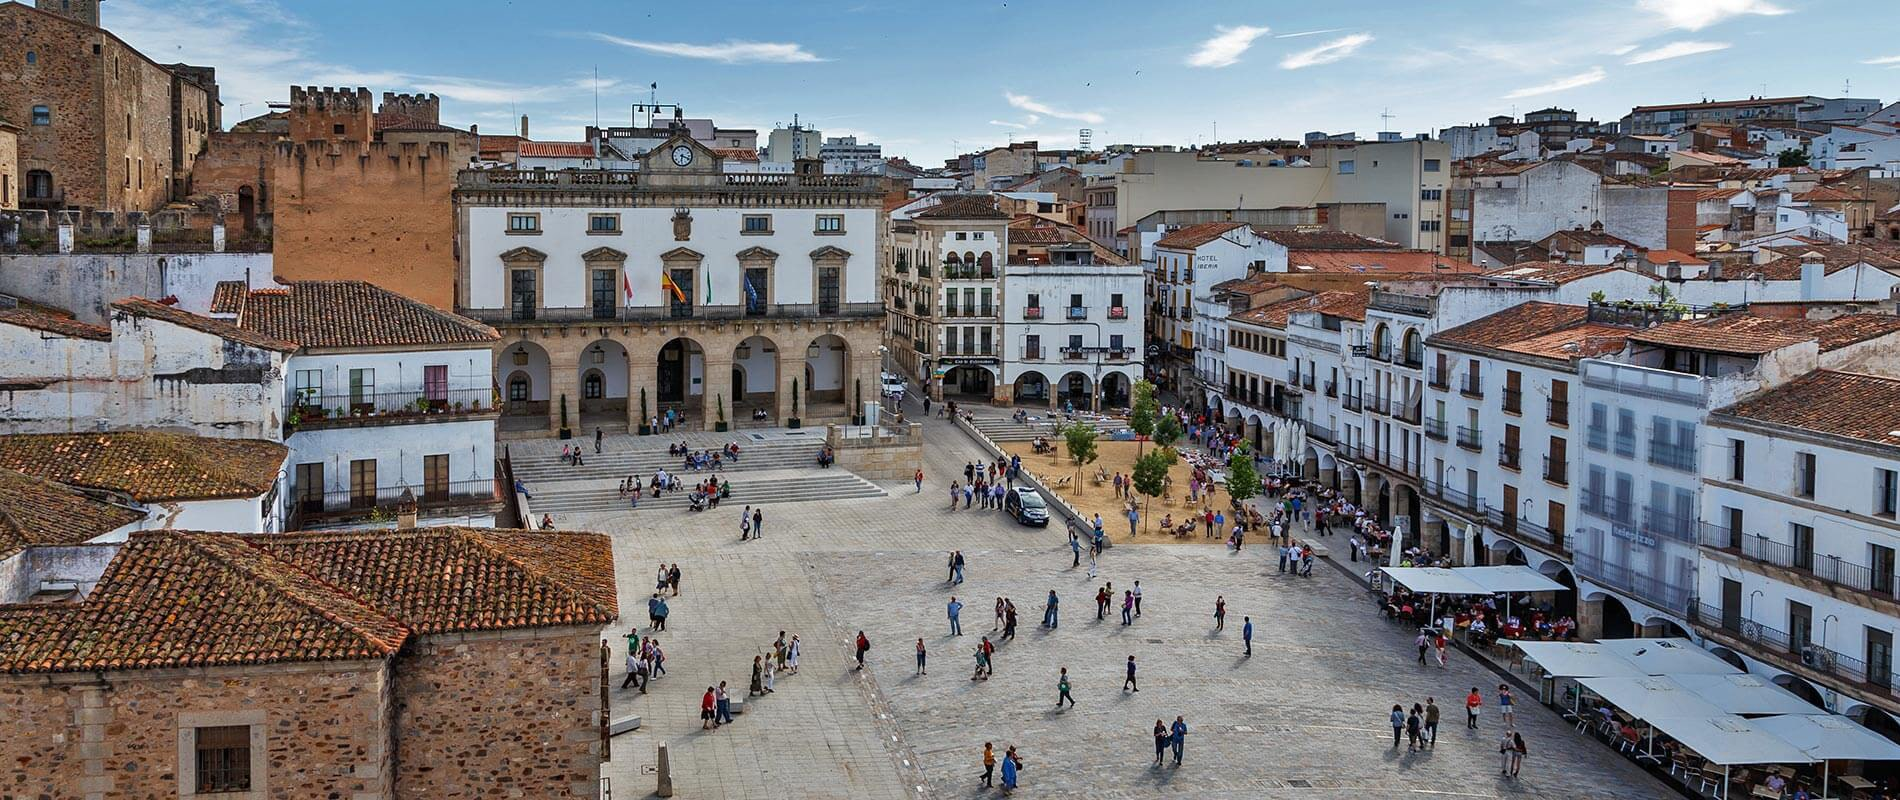 Motivos para visitar Cáceres